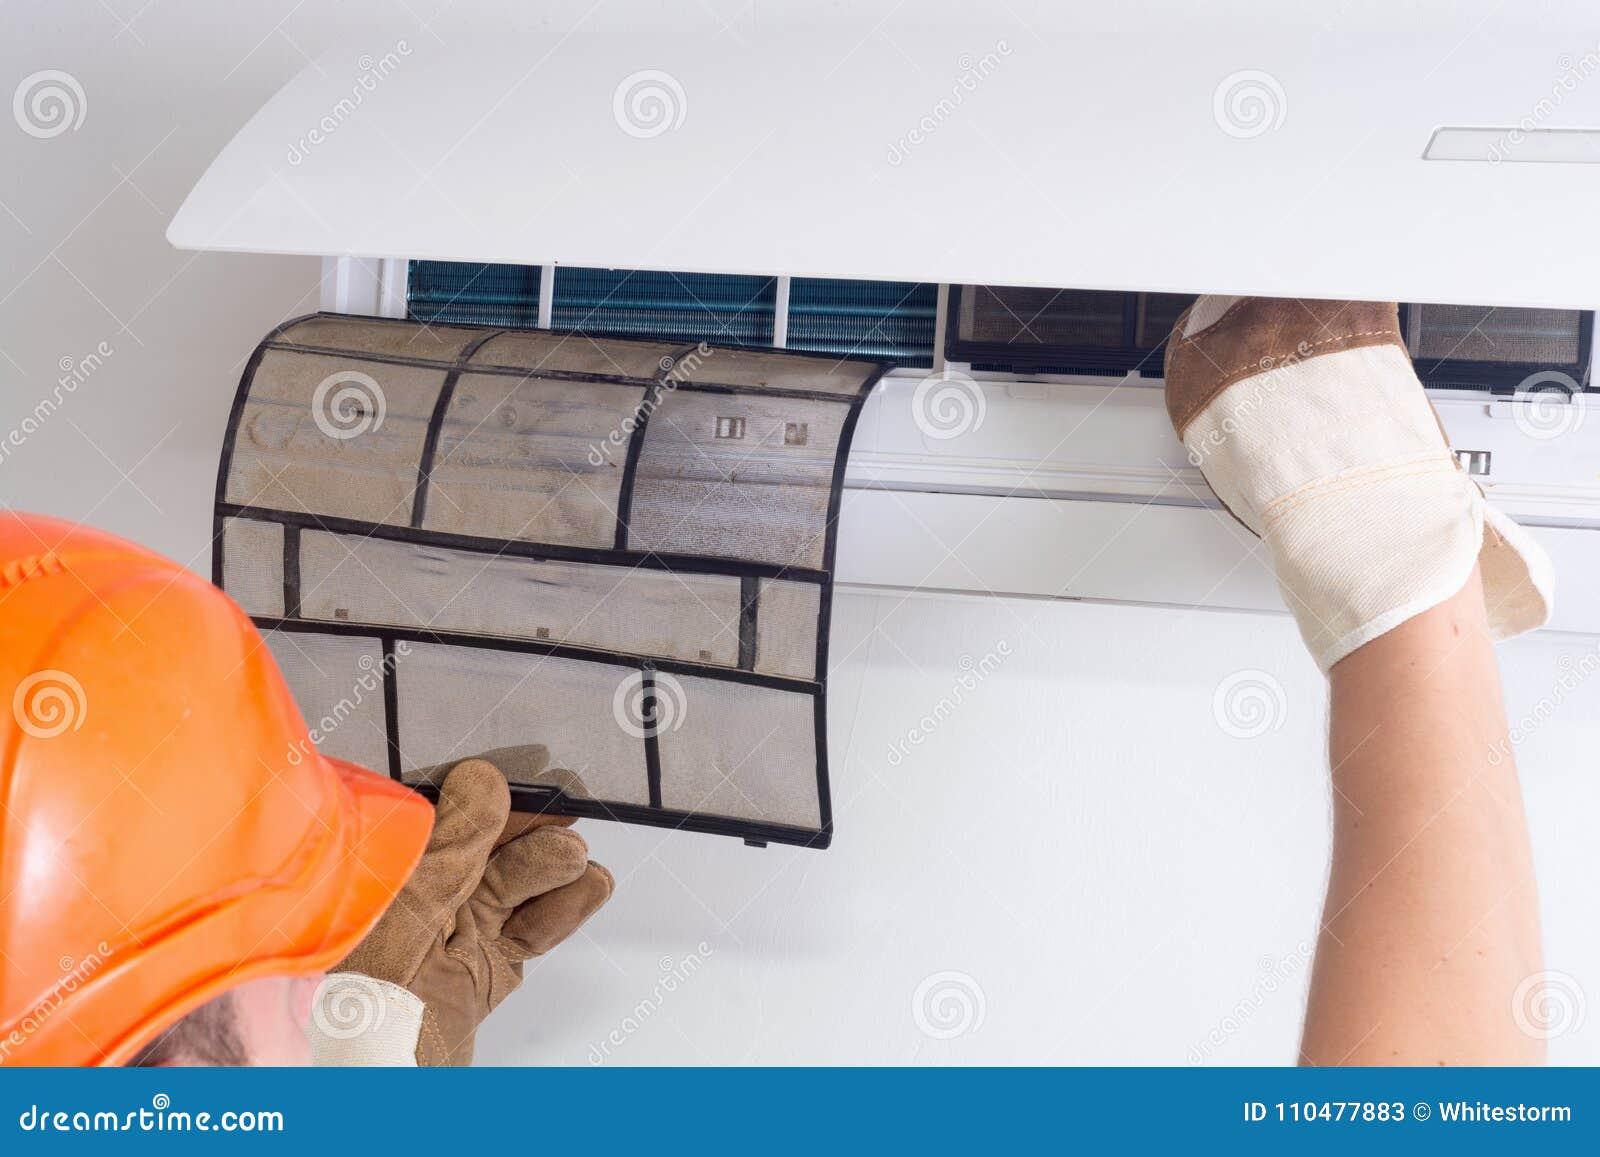 Removendo o filtro sujo do condicionador de ar